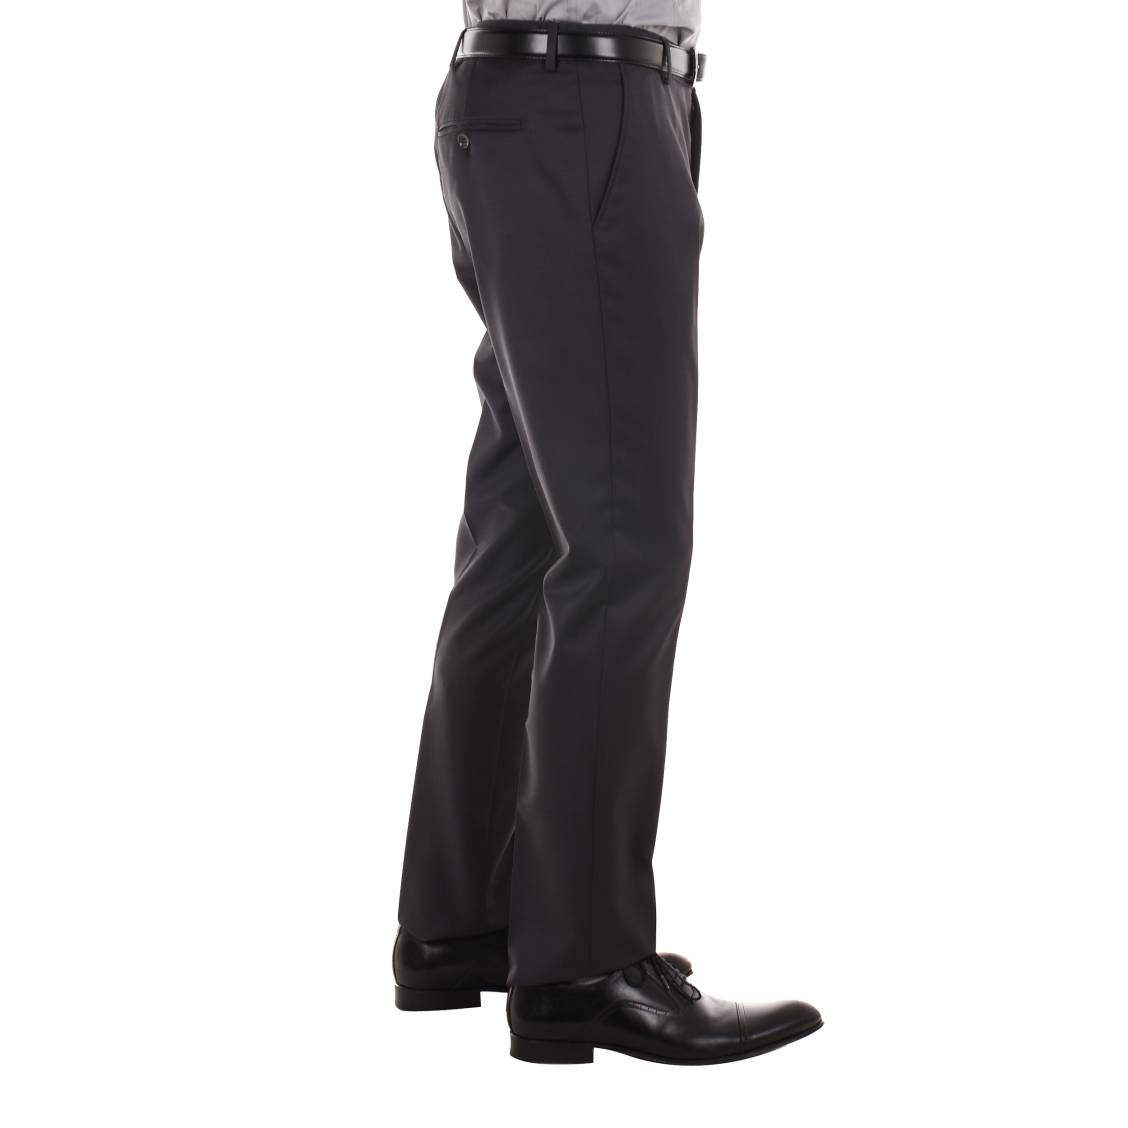 Pantalon de costume cintré anthracite